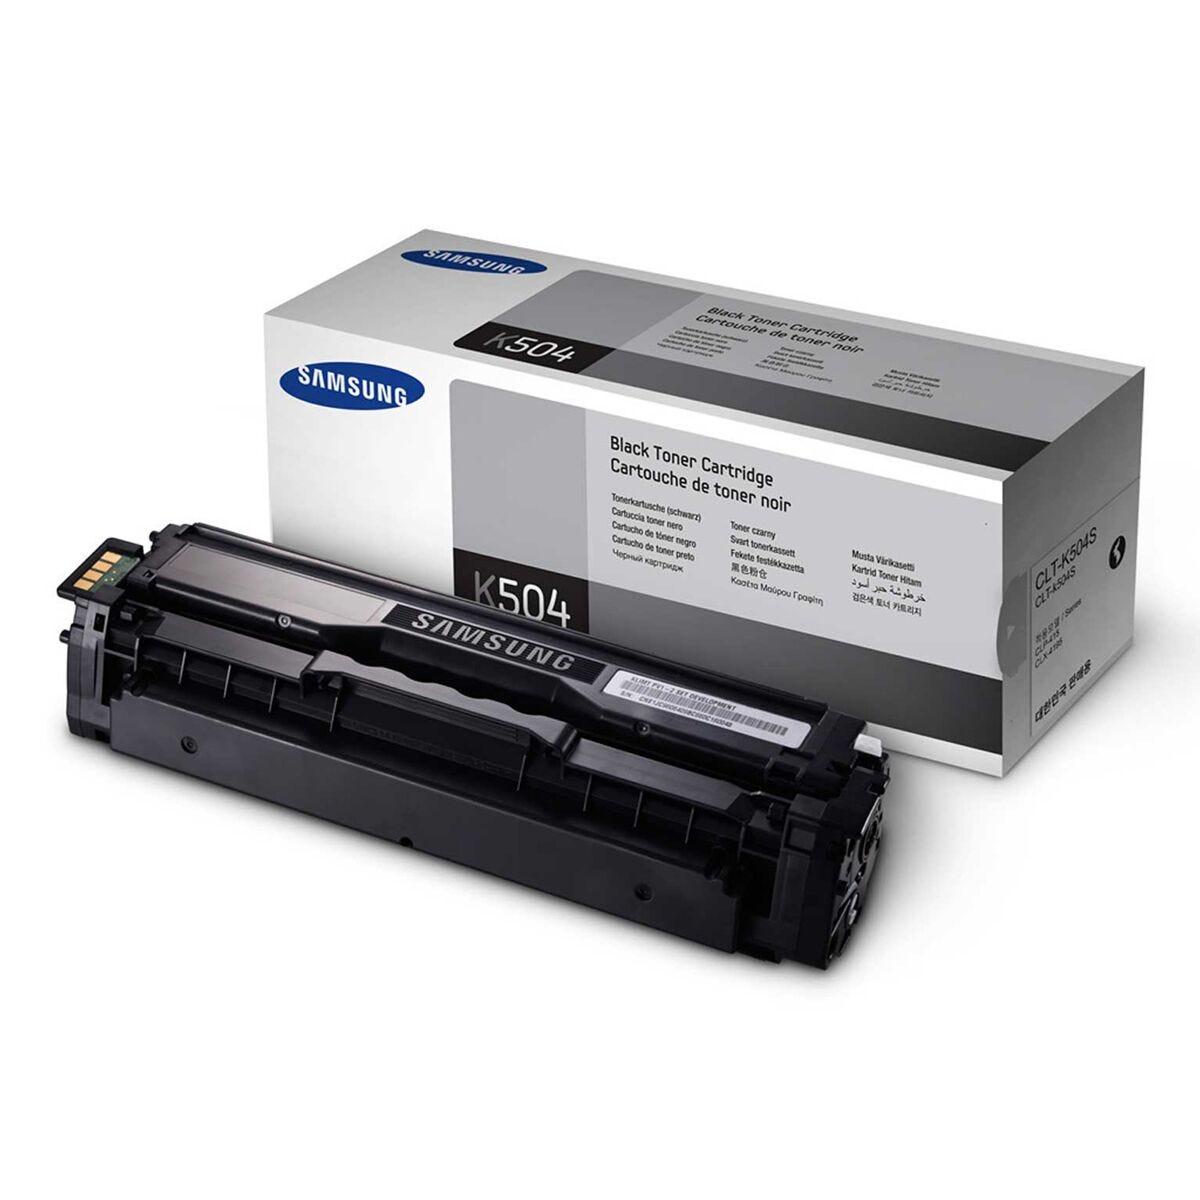 Samsung CLT-504S/ELS Inkjet Toner Cartridge Black Black